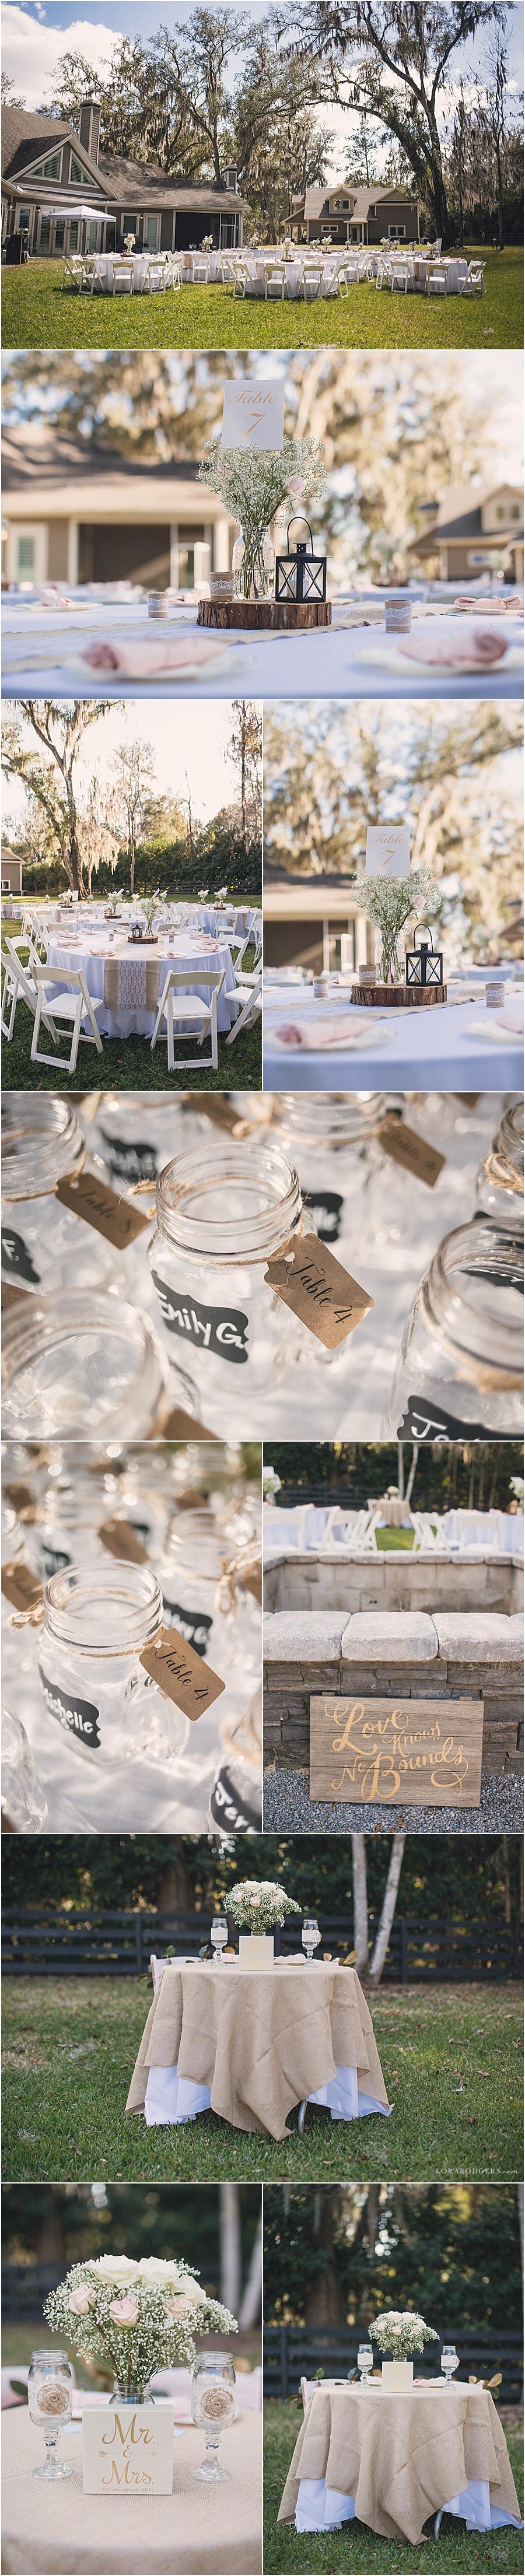 Country_Chic_Ocala_Wedding_014